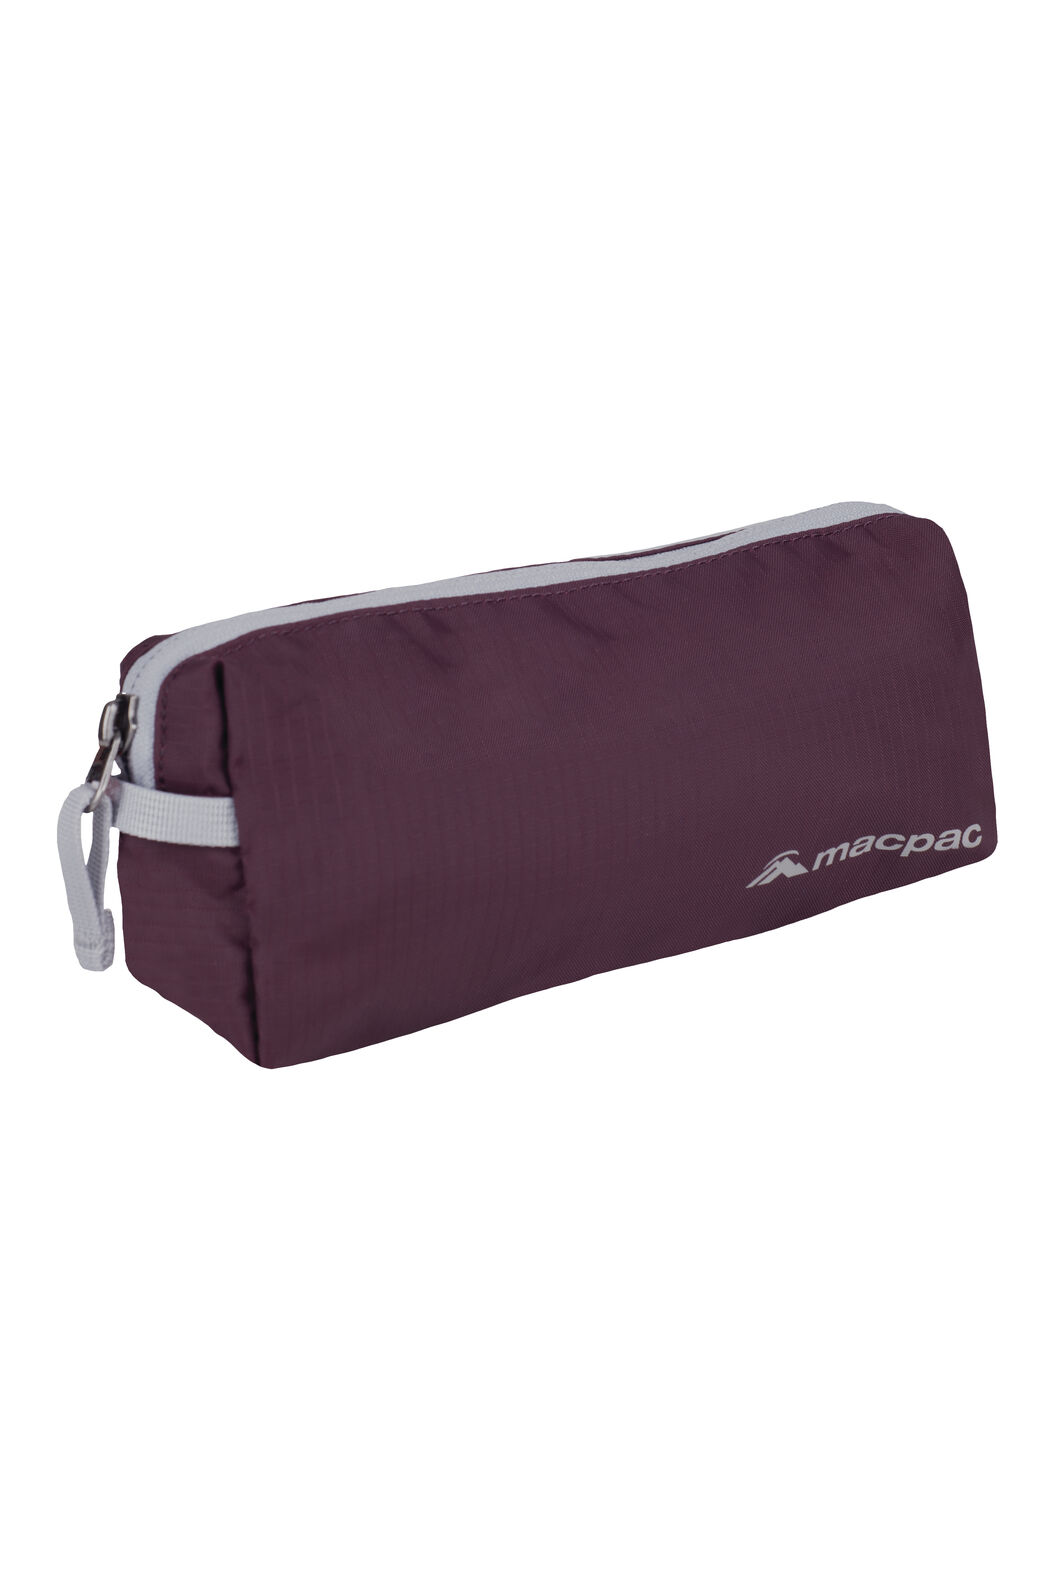 Macpac Carry-On Wash Bag, Winetasting, hi-res